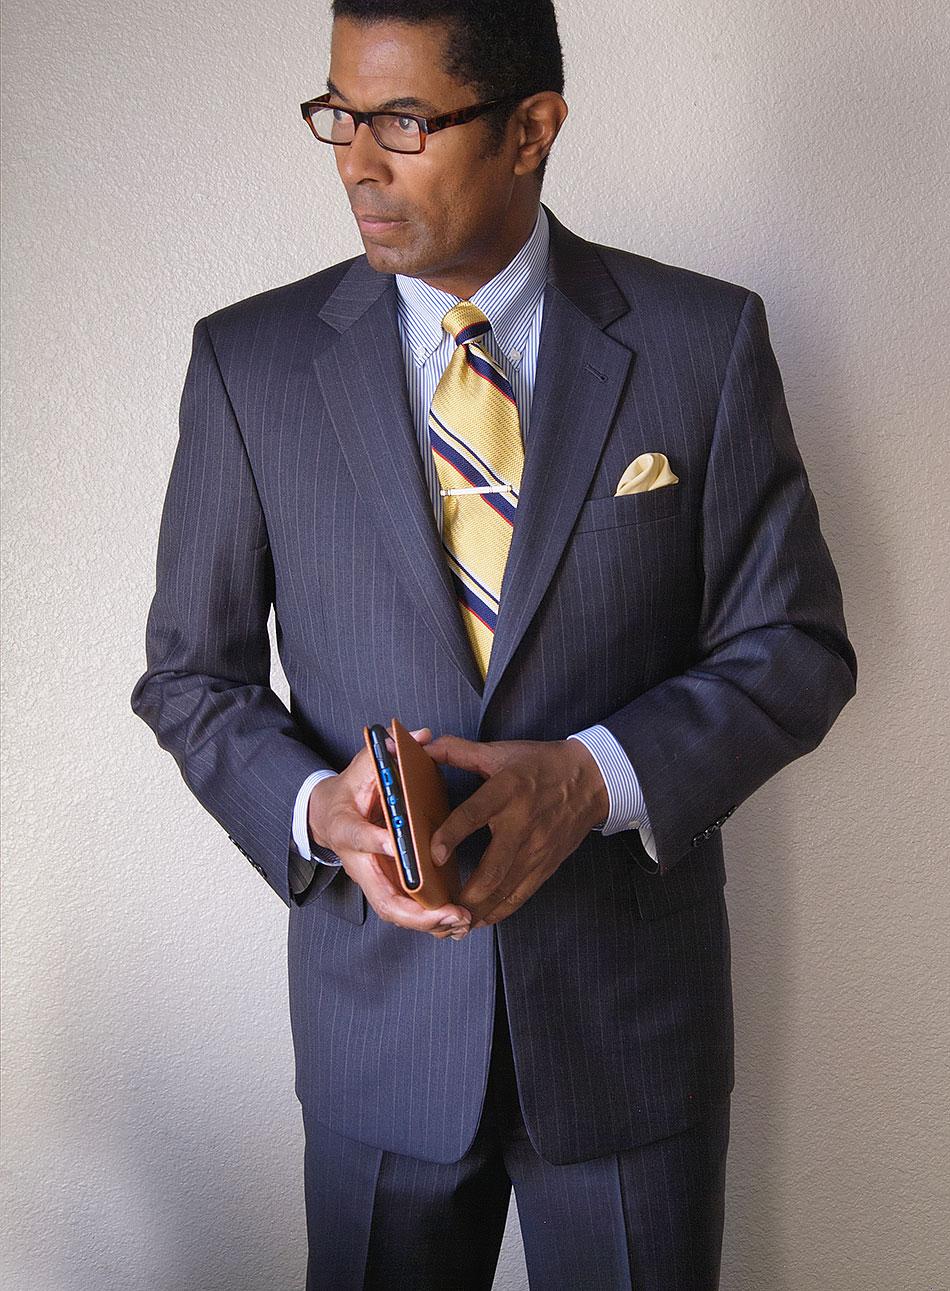 Are Jos  A Bank Suits a Good Buy? | SplurgeFrugal com